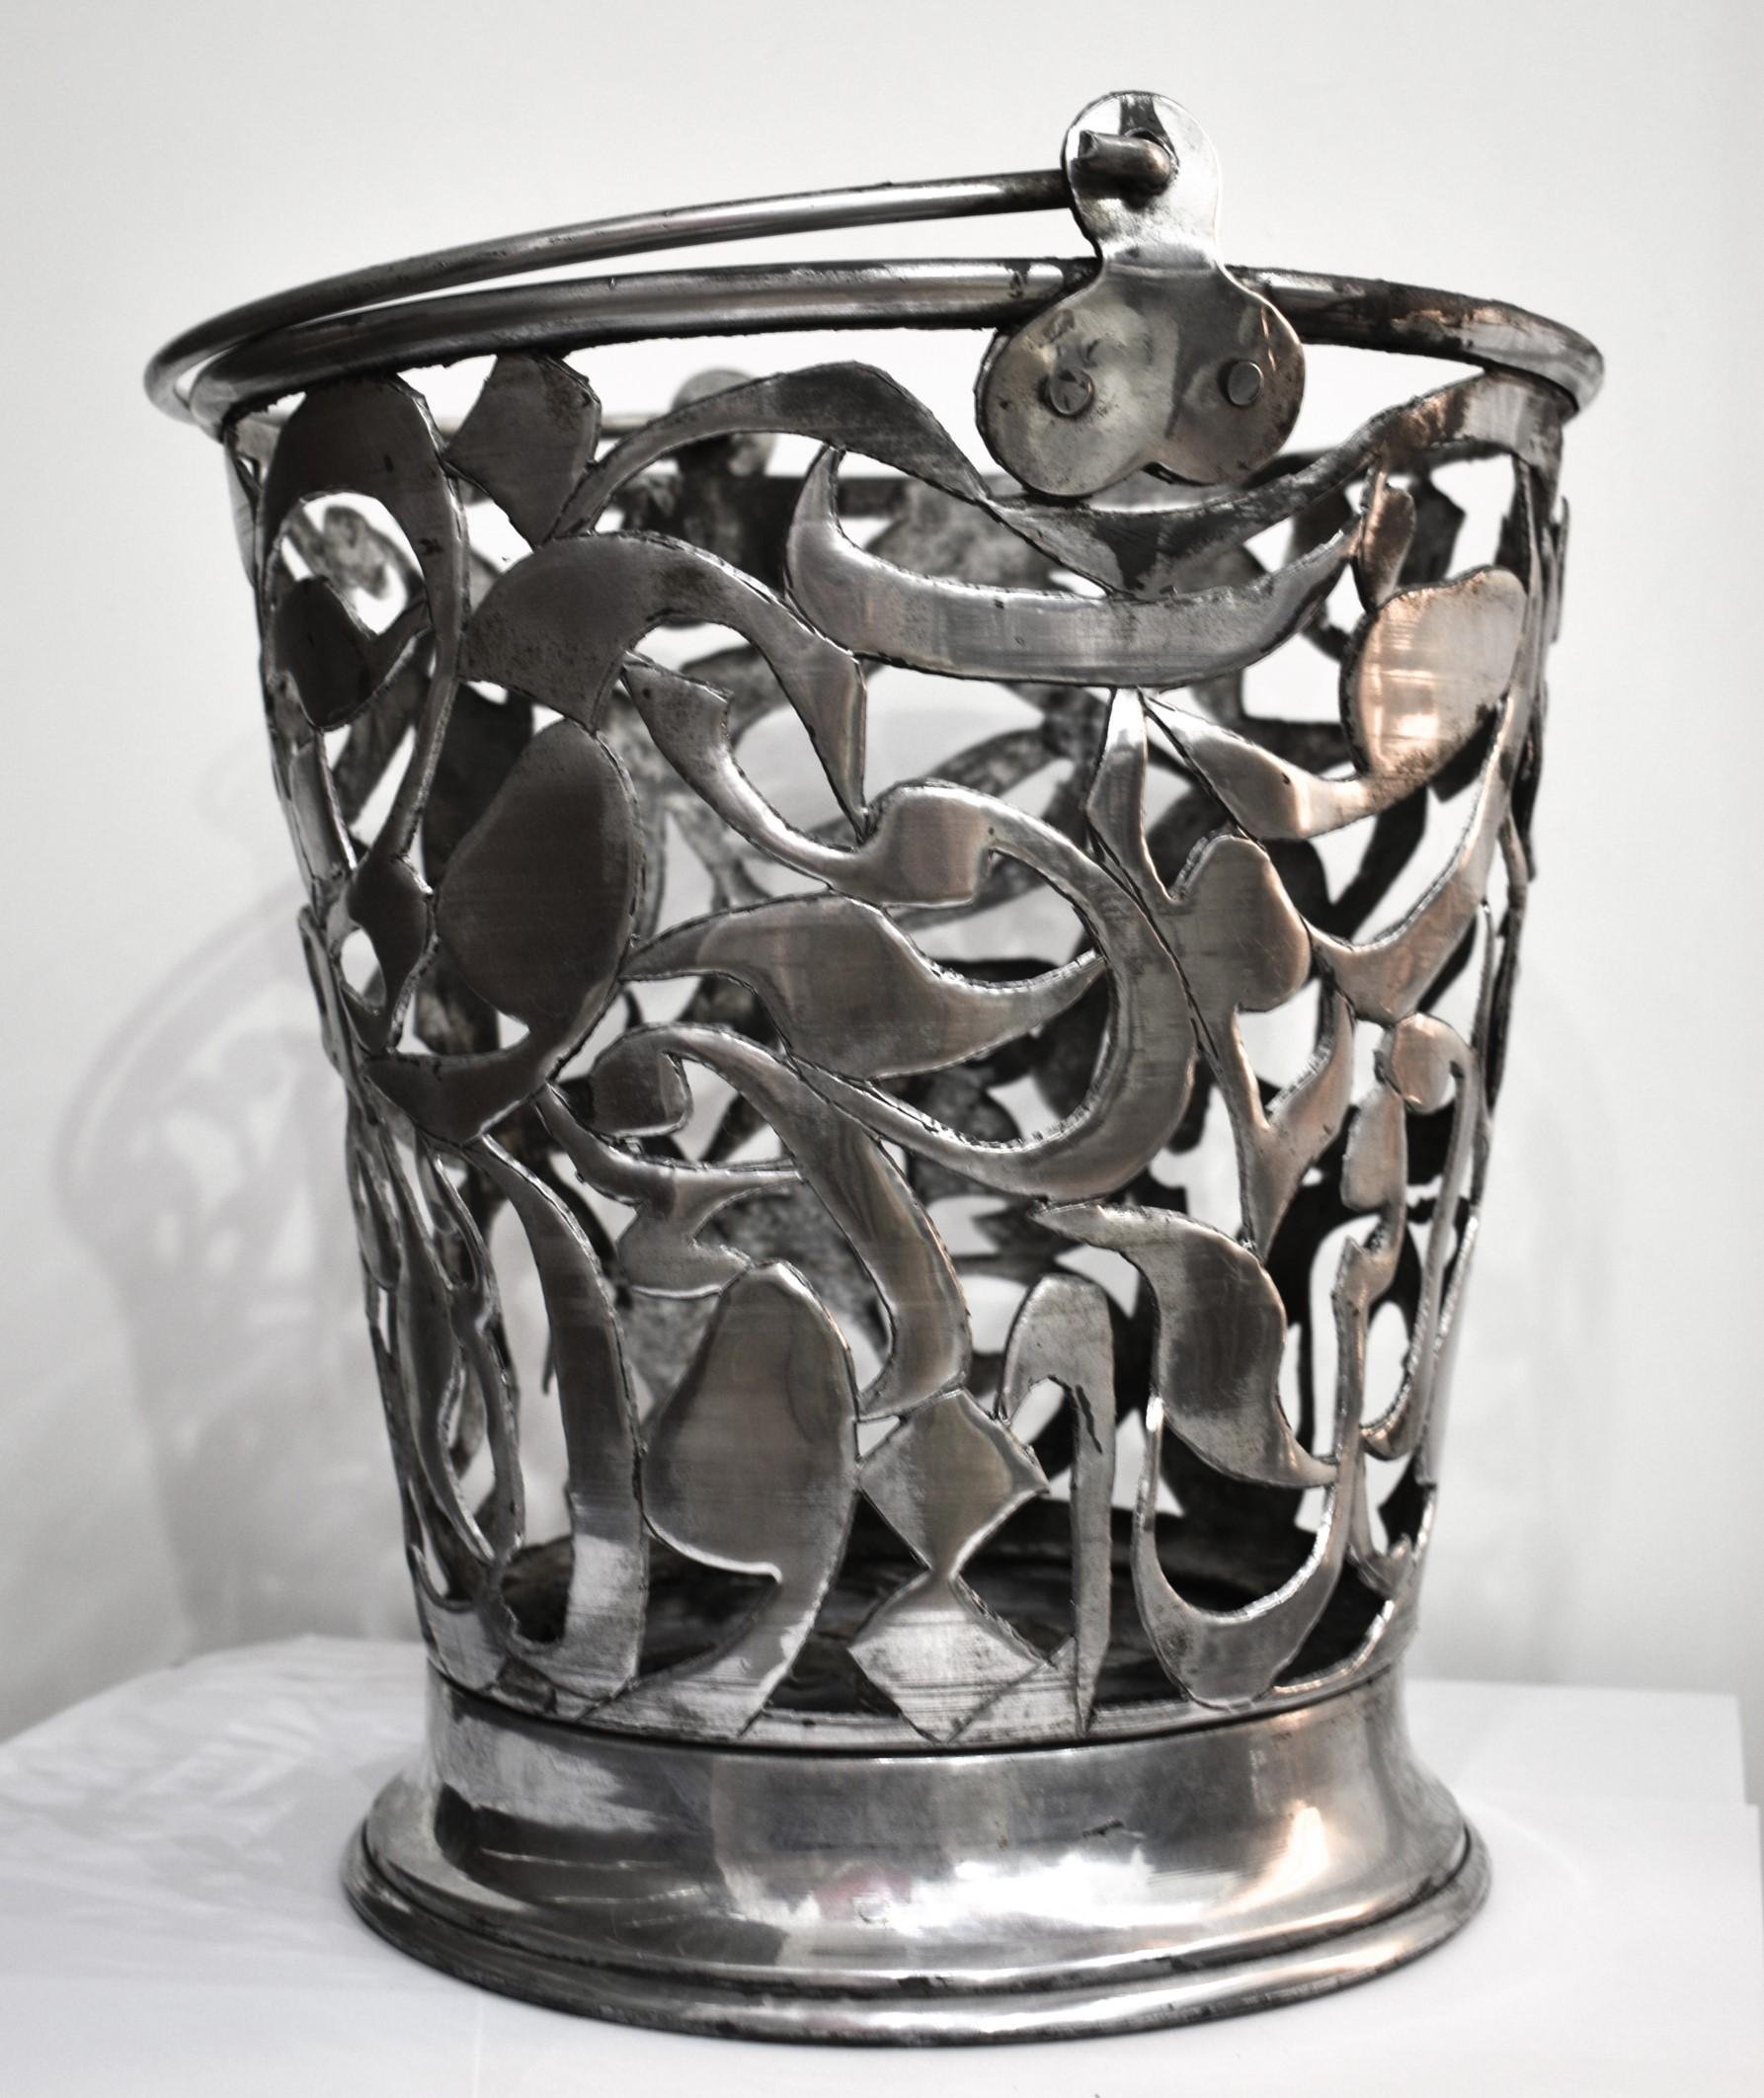 Title: Baalti<br></br>Size: 32cm,  Diameter (Max):29cm<br></br>Medium: Metal<br></br>Font: Nastaliq